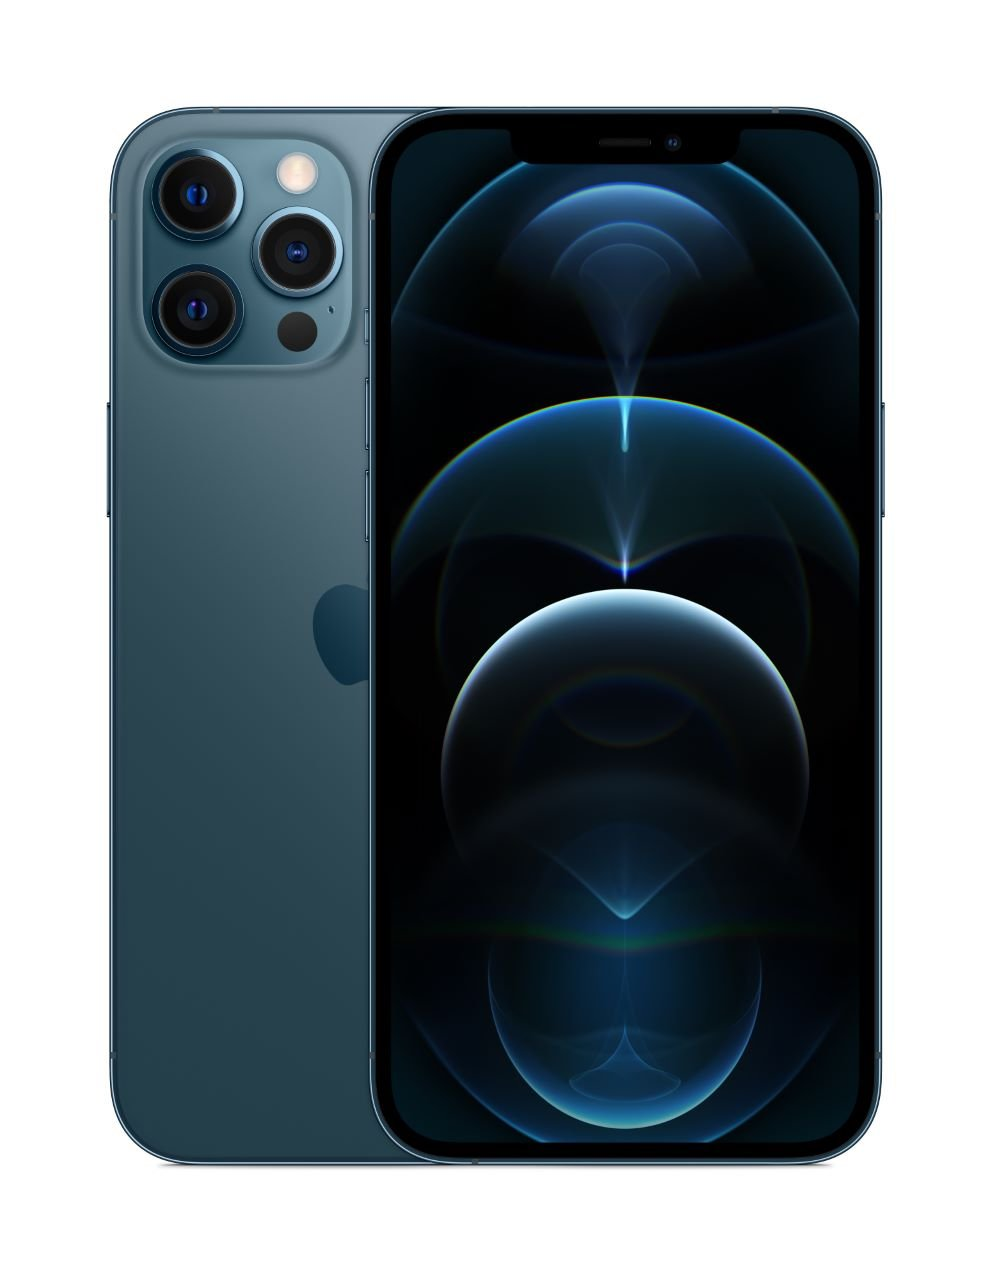 Apple iPhone 12 Pro Max Pazifikblau 512 GB MGDL3ZD/A